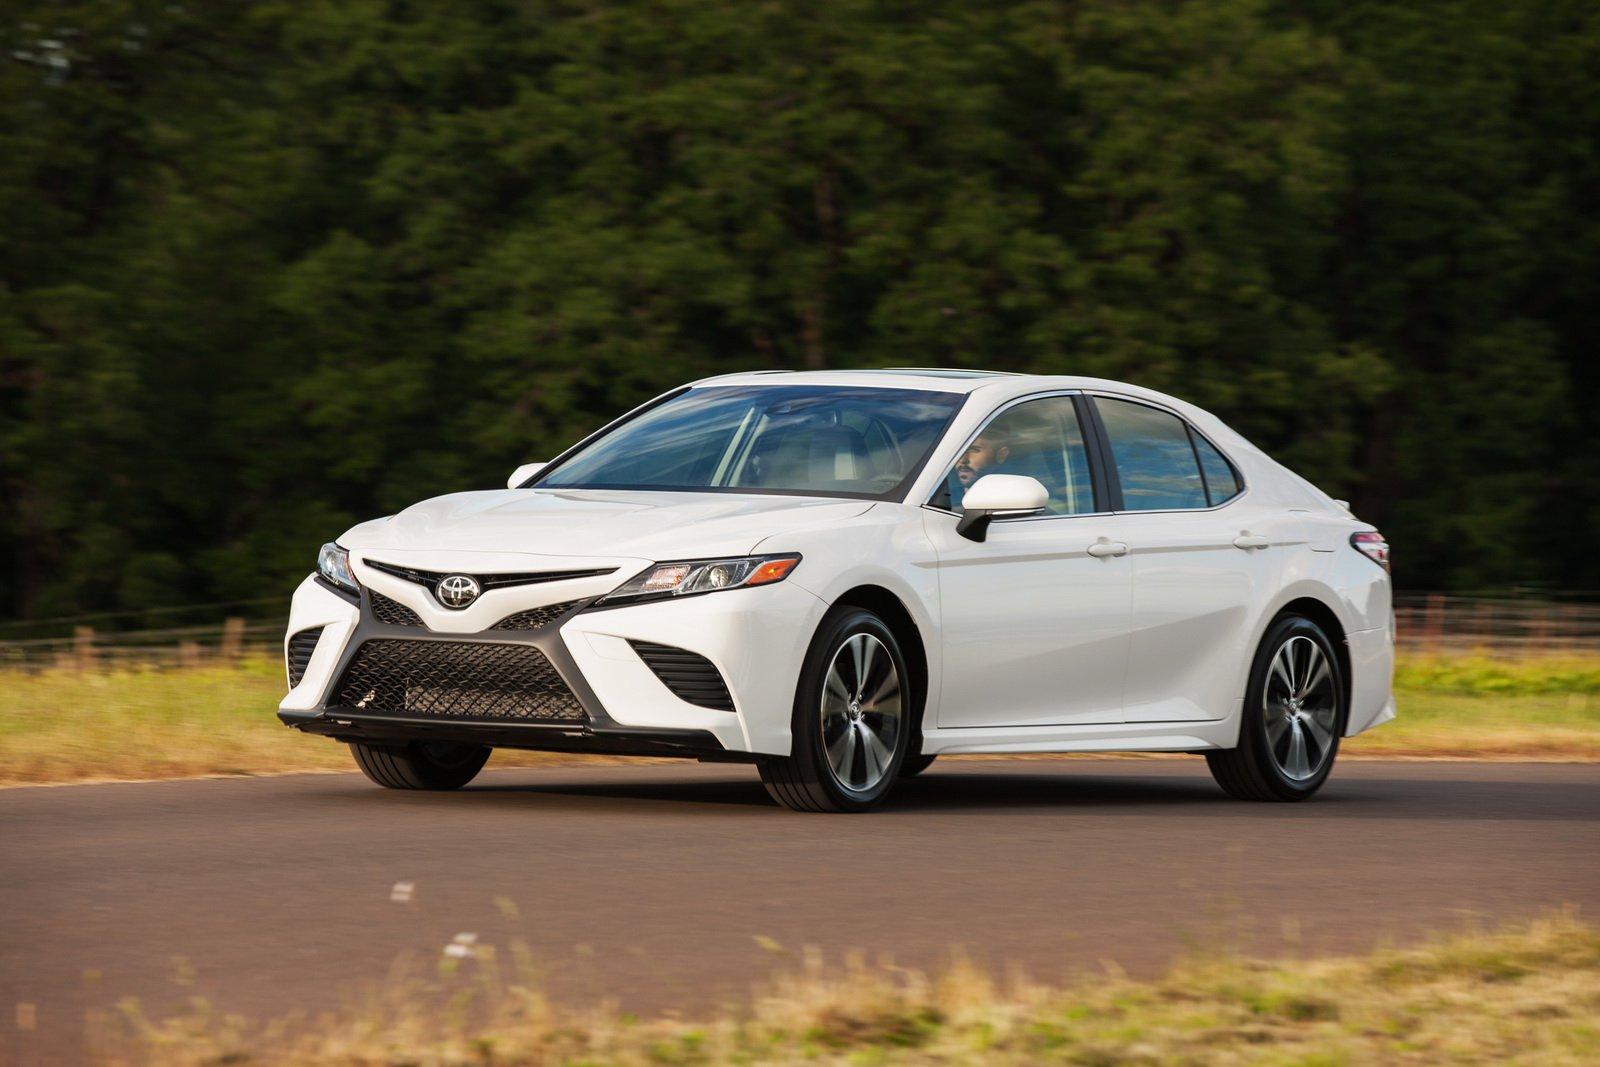 top-10-sedan-ban-chay-2018-toyota-camry-1.jpg